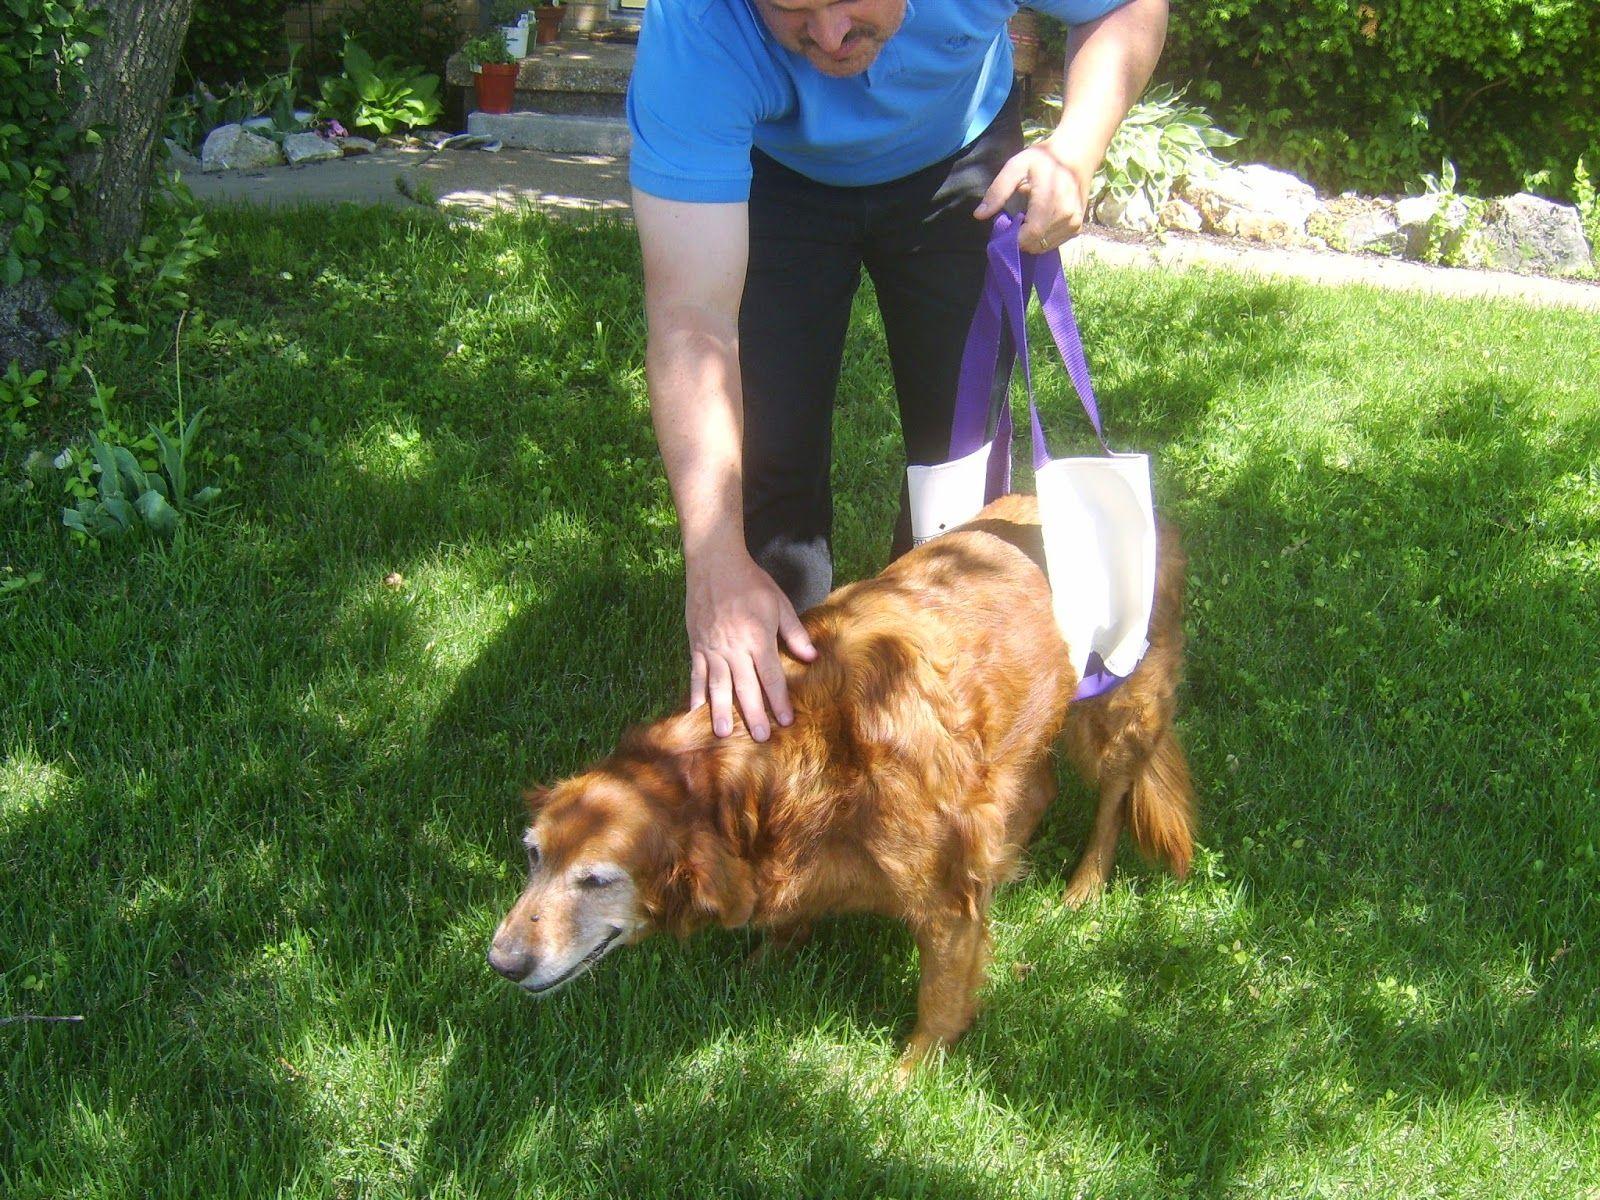 How To Make Your Own Dog Lift Sling Diy Diy Dog Stuff Dogs Dog